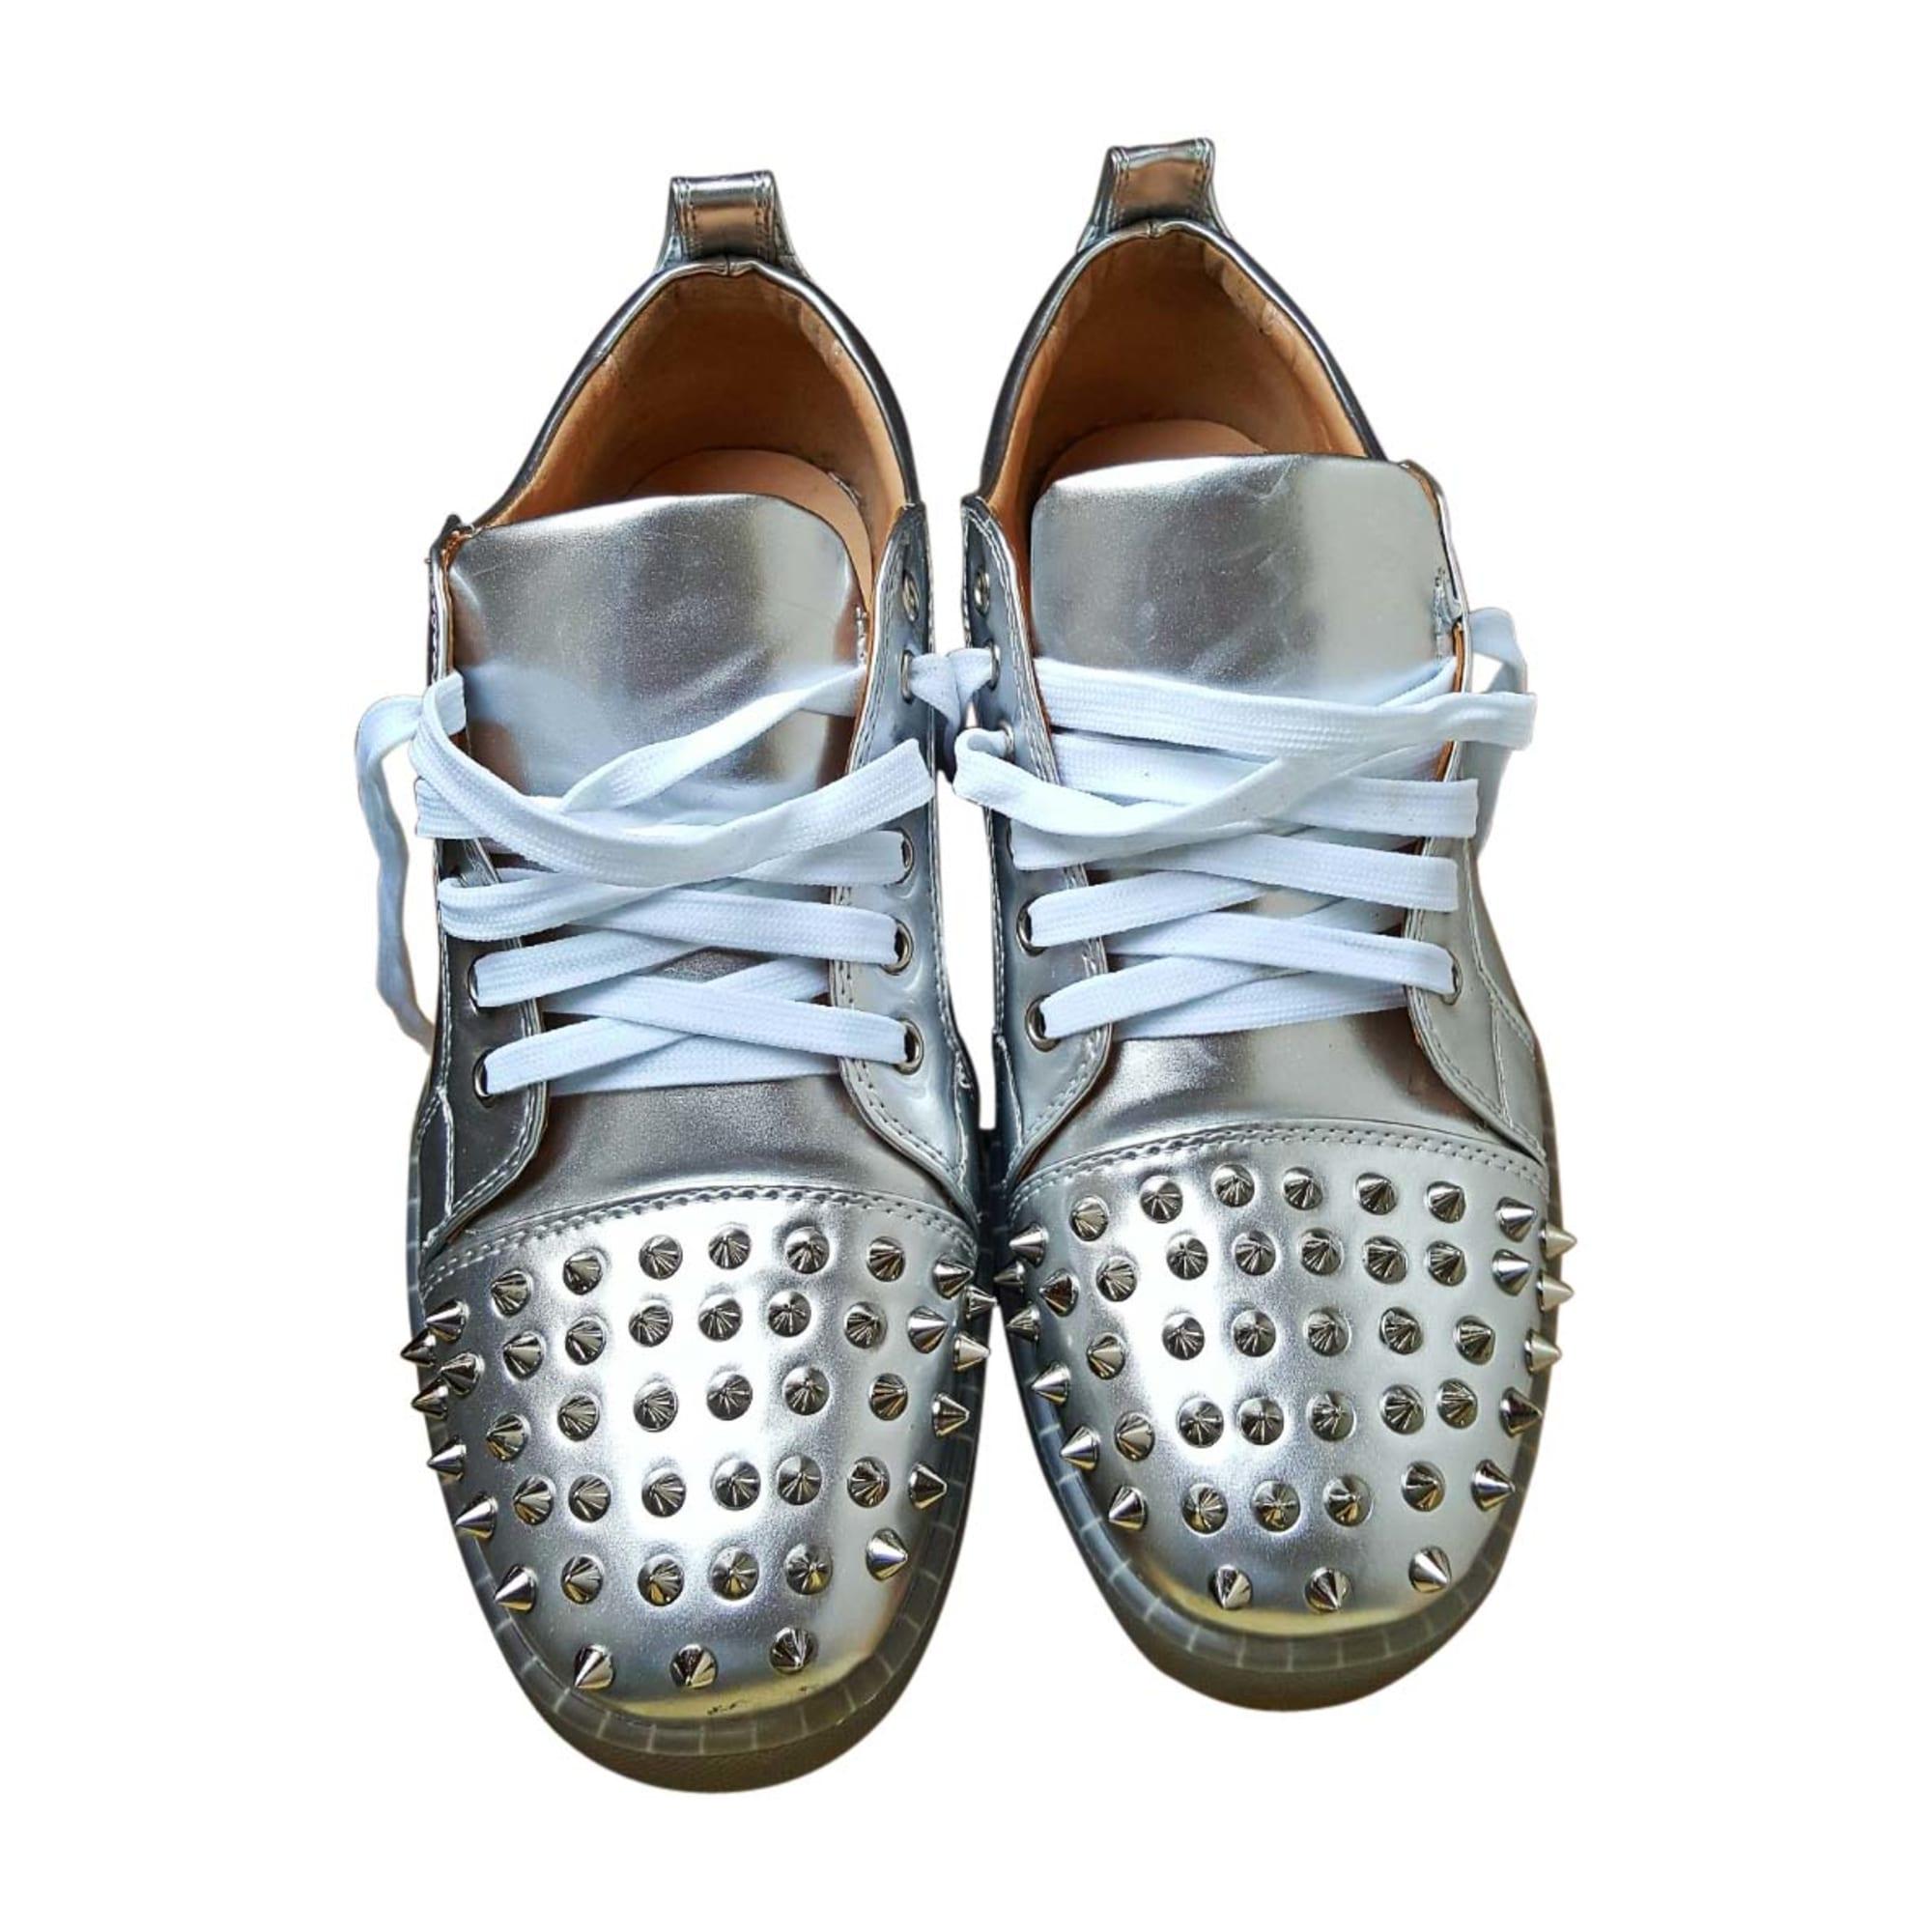 Sneakers CHRISTIAN LOUBOUTIN Grau, anthrazit